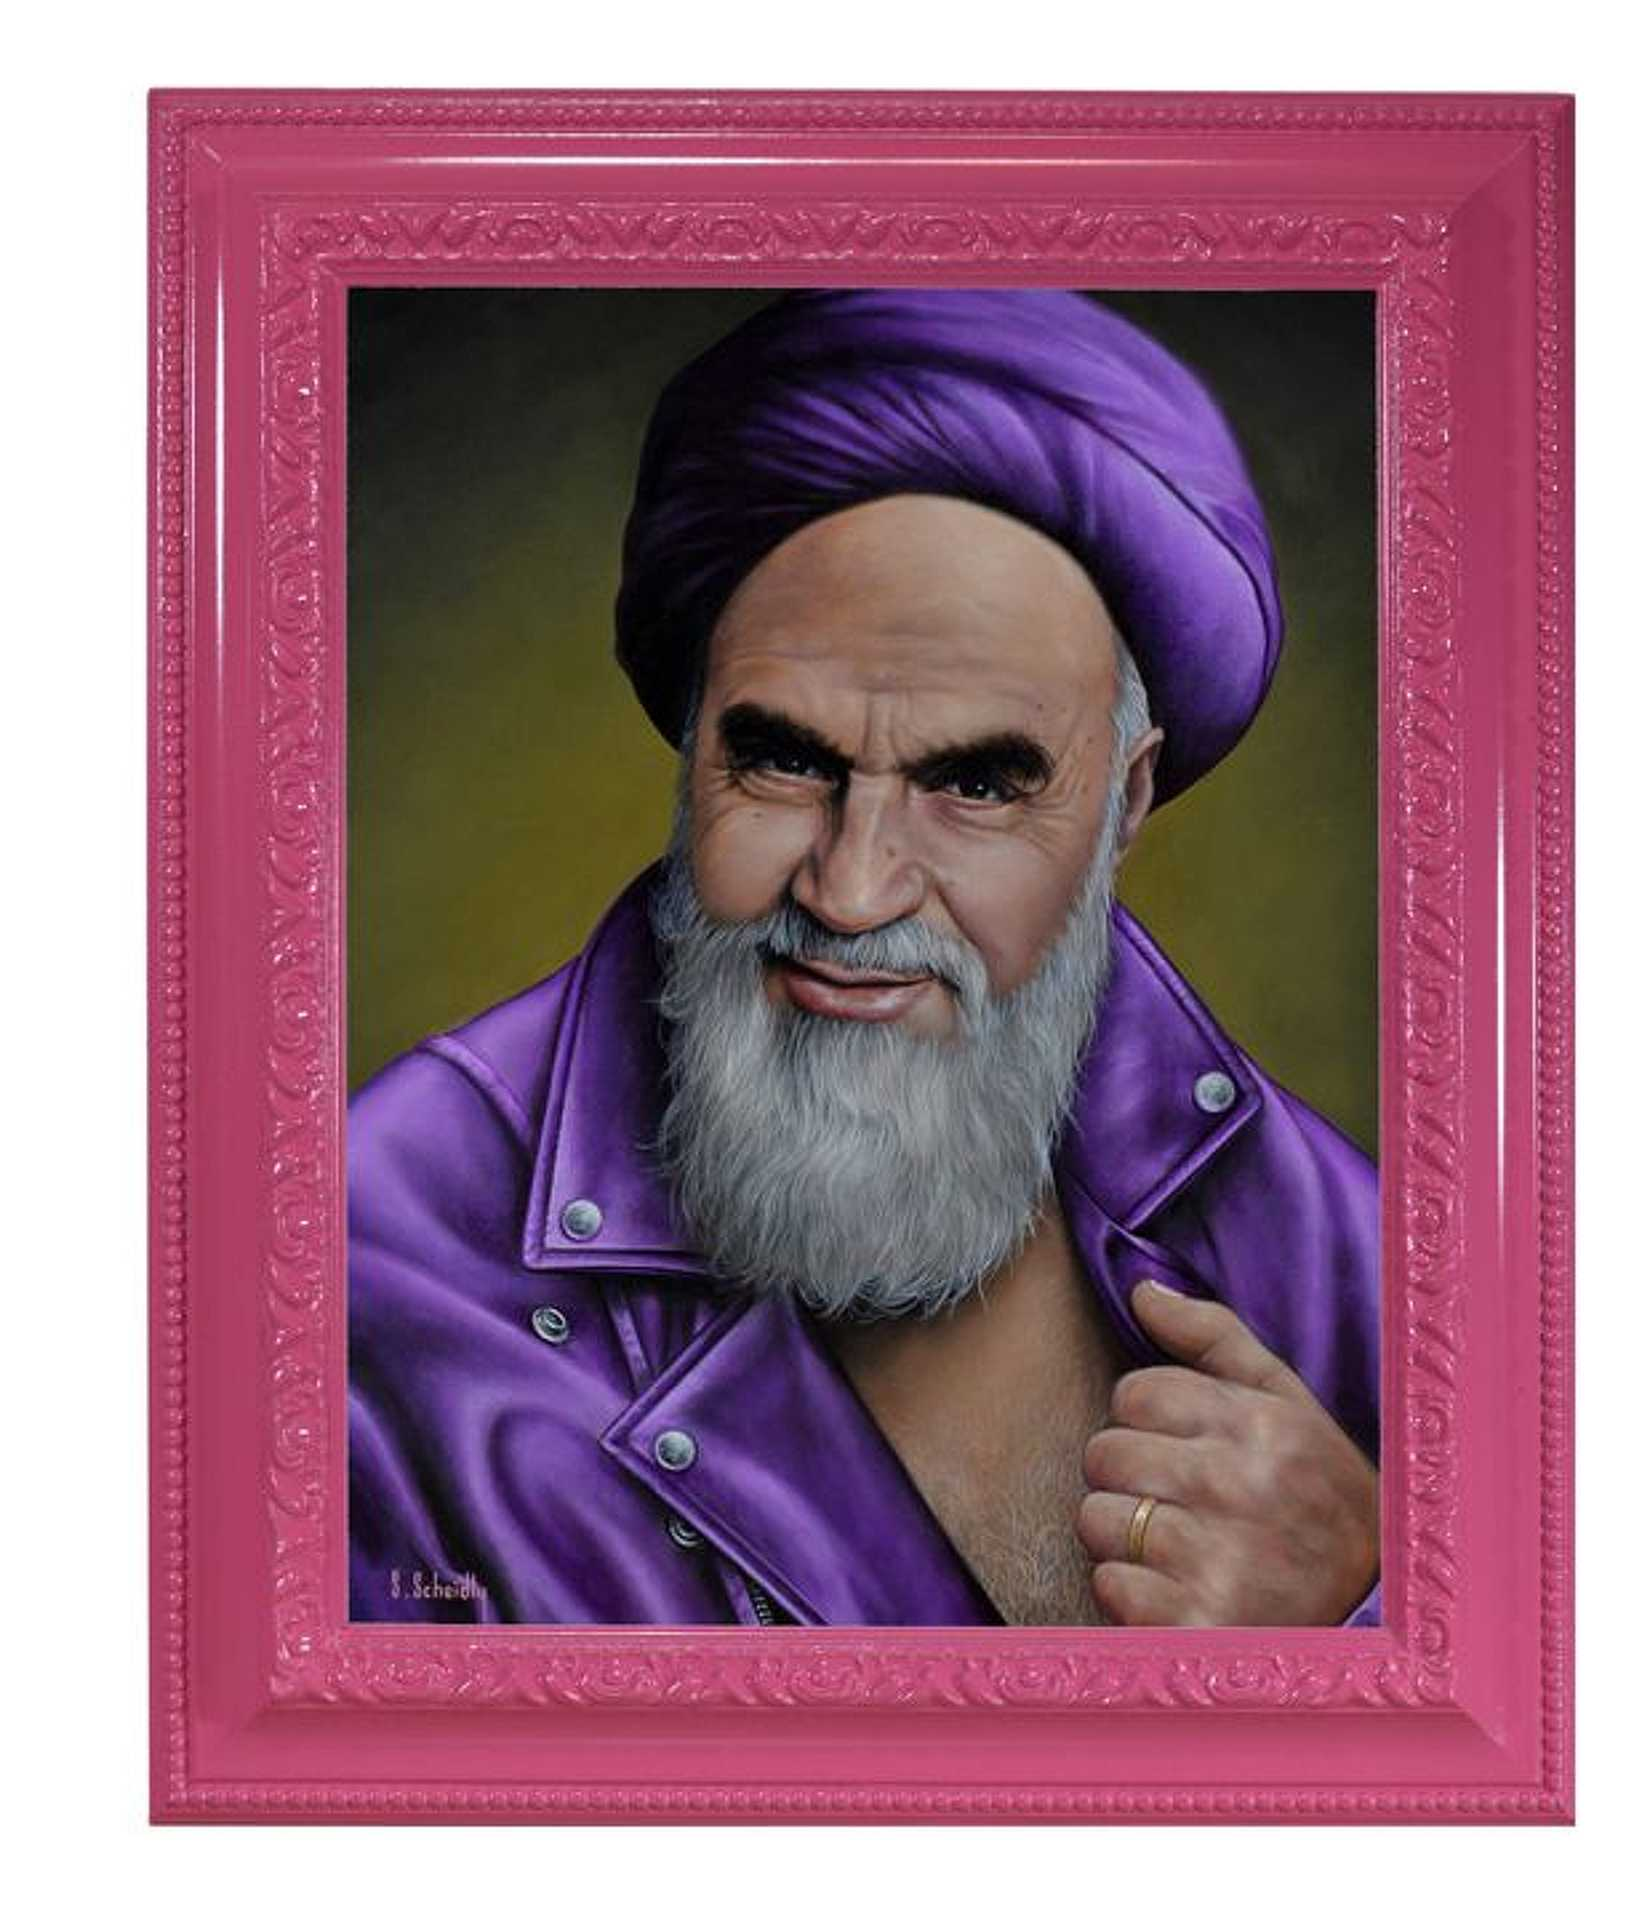 Ruhollah Khomeini